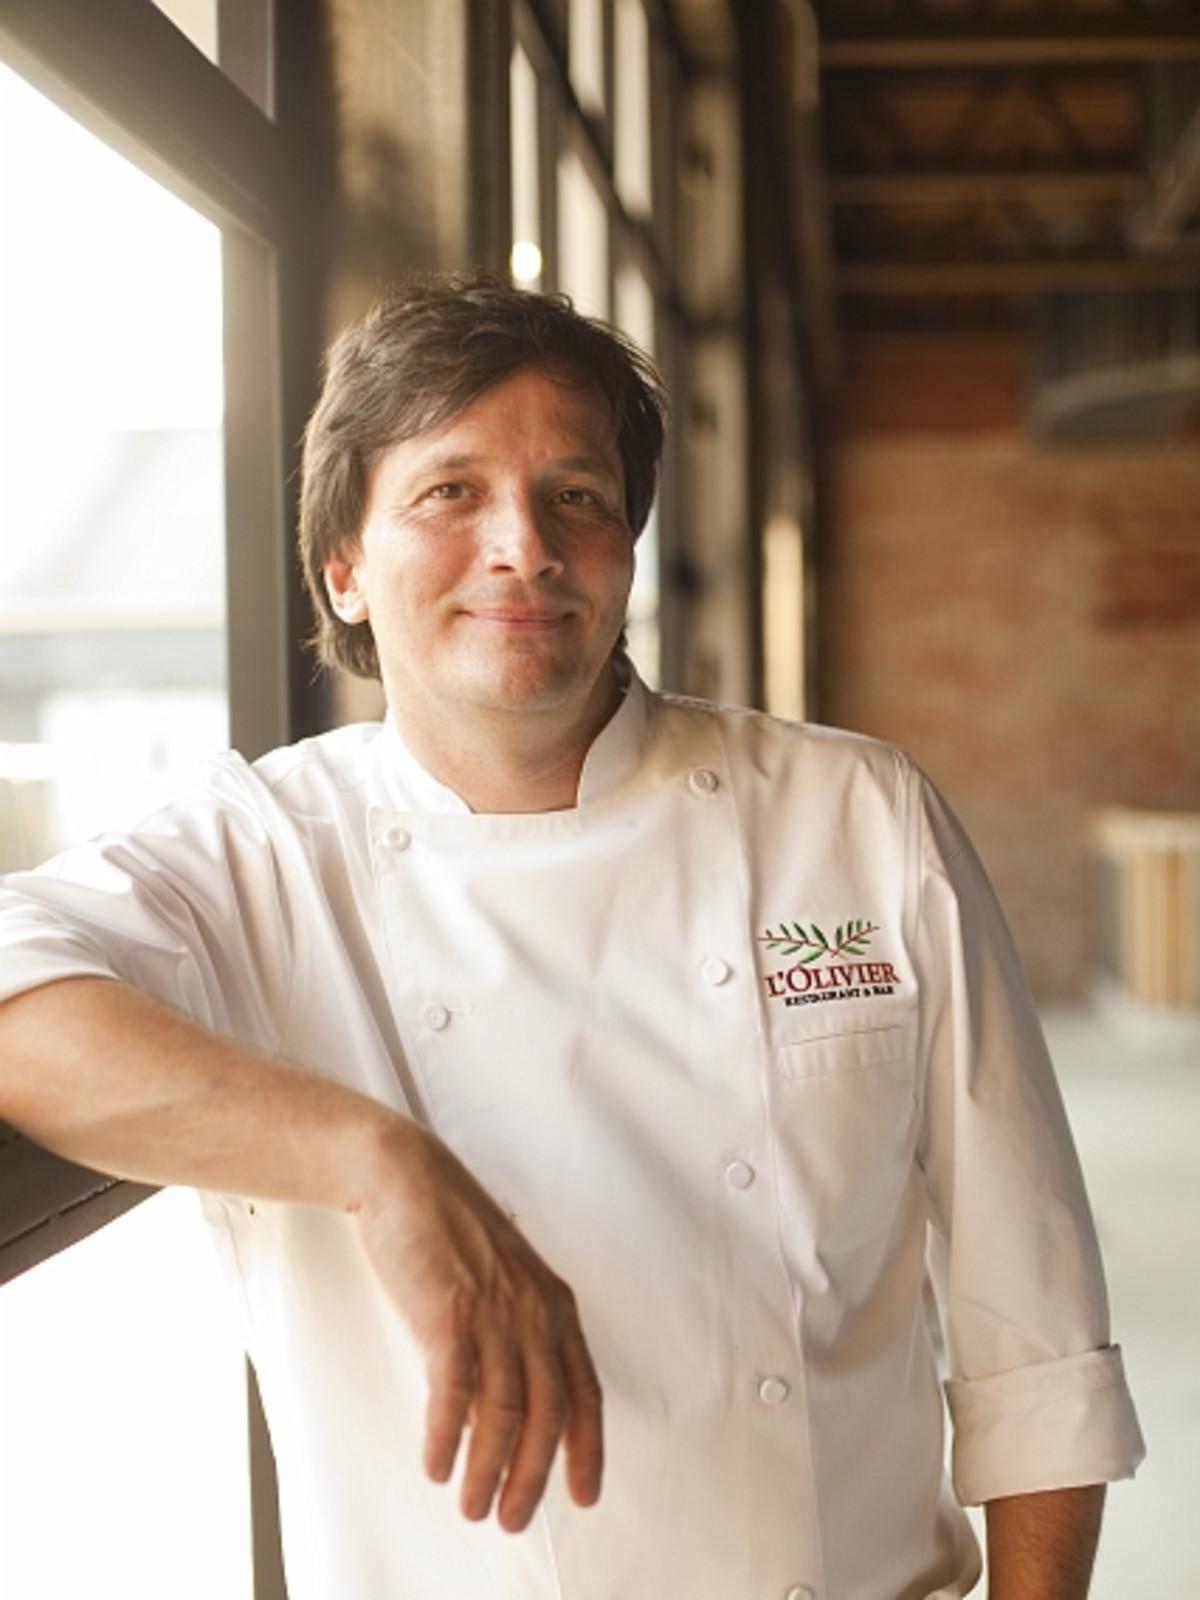 Chef Olivier Ciesielski of L'Olivier Restaurant